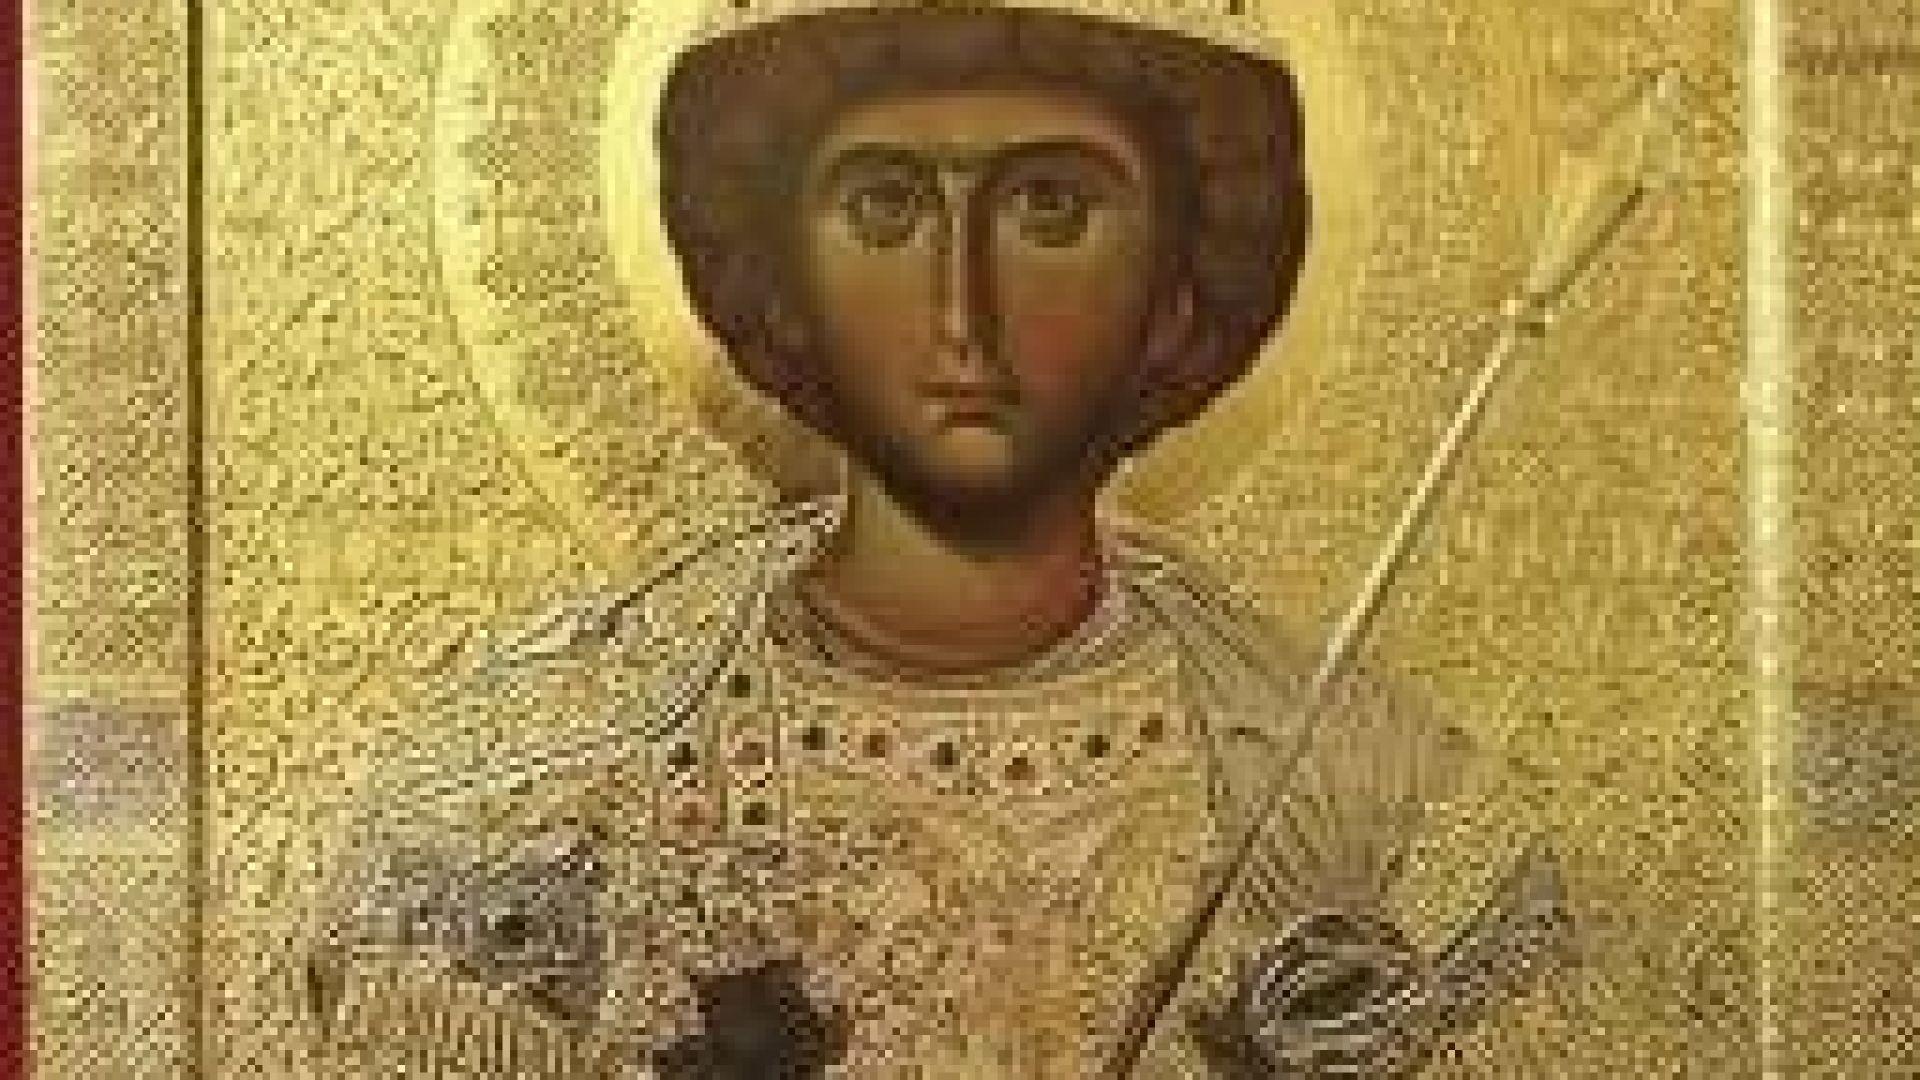 Икона на Св. Георги от Зографския манастир пристига в София